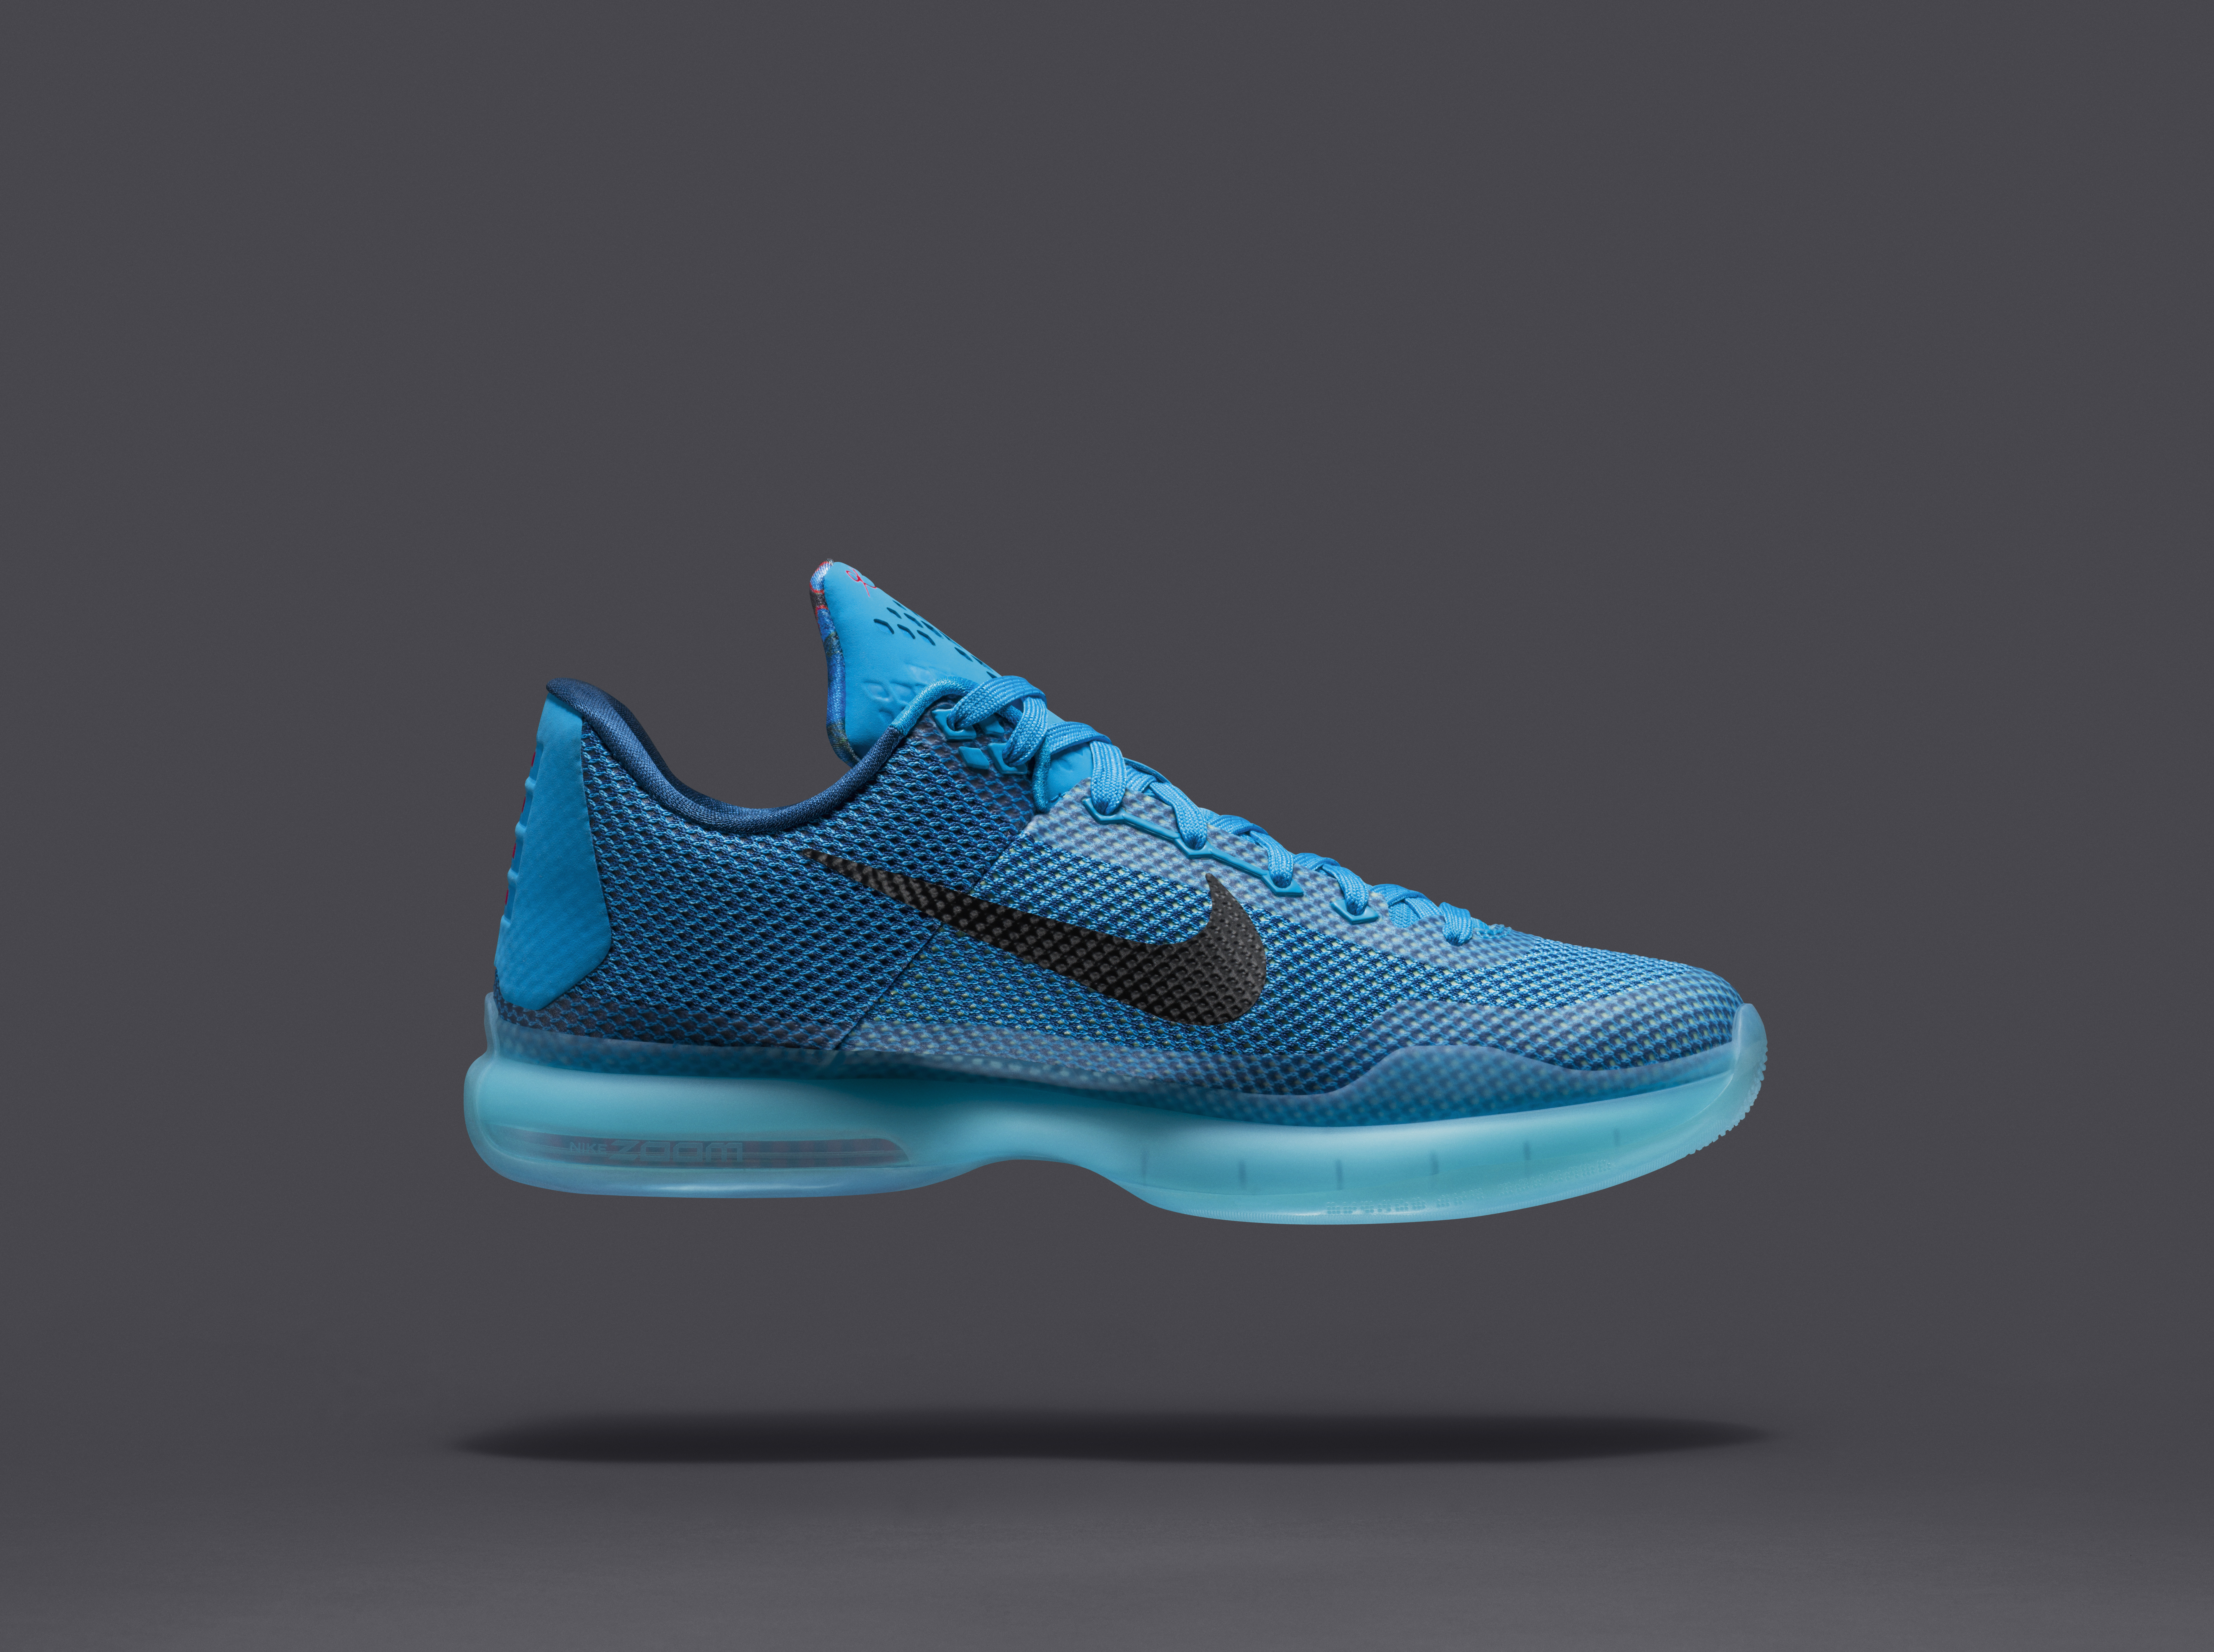 buy nike kobe 10 jordan tennis shoes